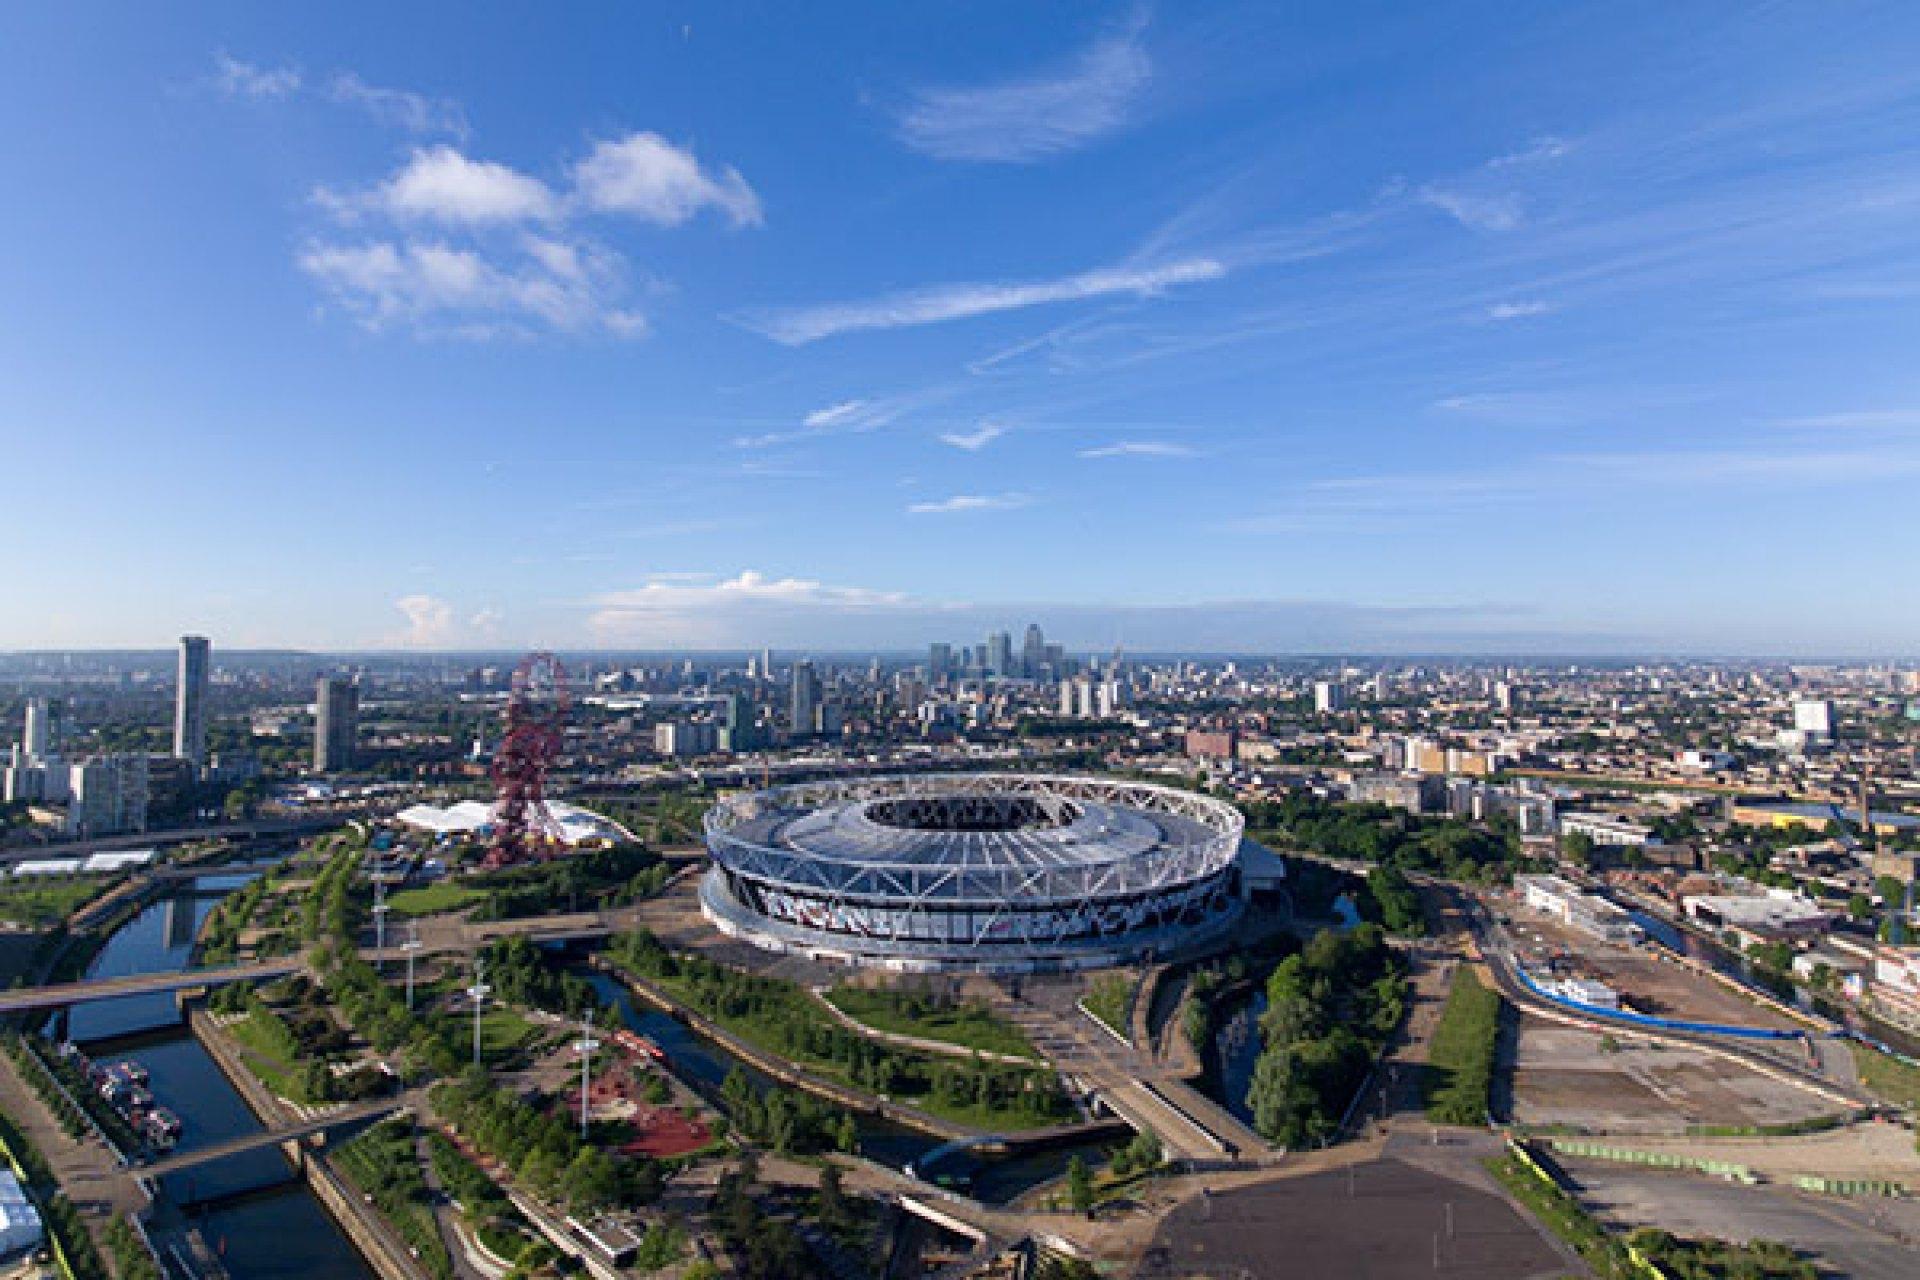 West Ham United in London.